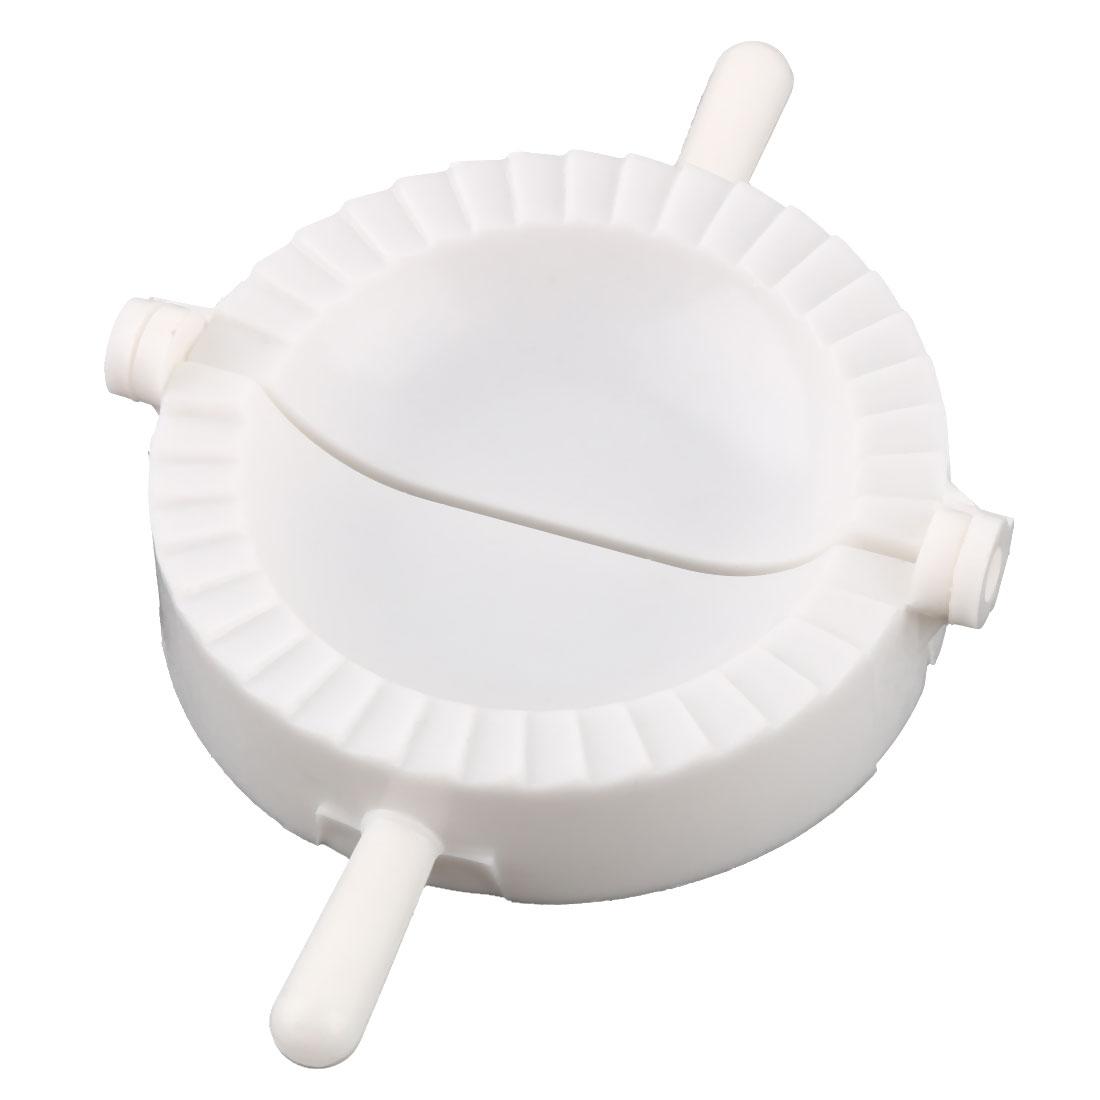 Household Kitchenware Plastic Pie Wonton Pastry Dumpling Making Tool Mold White